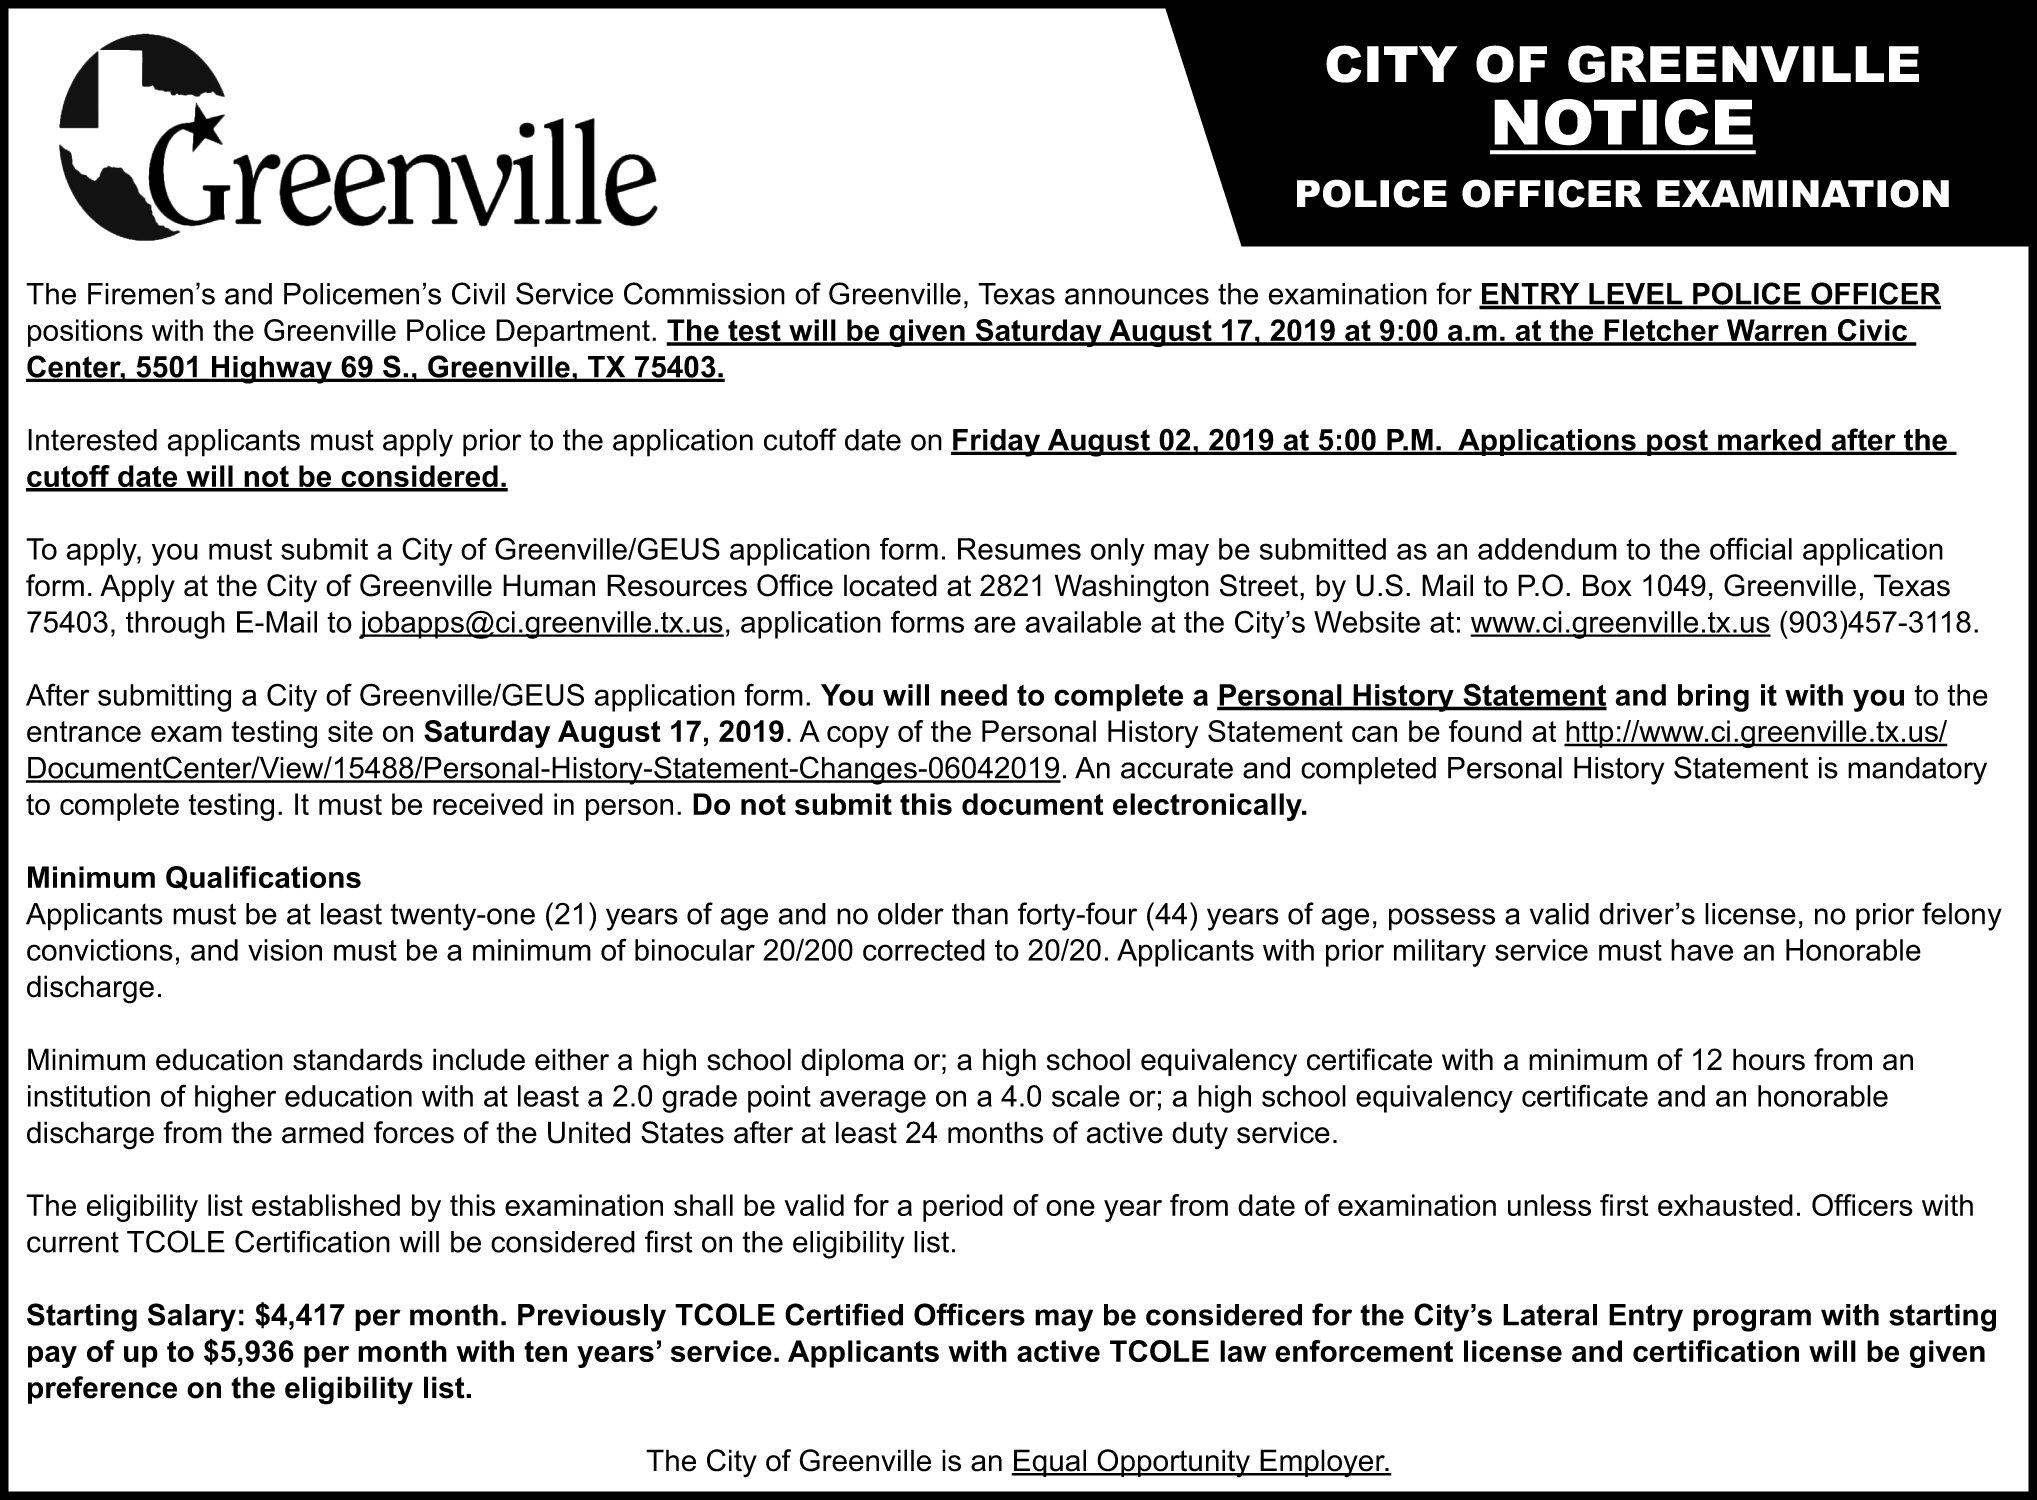 City of Greenville